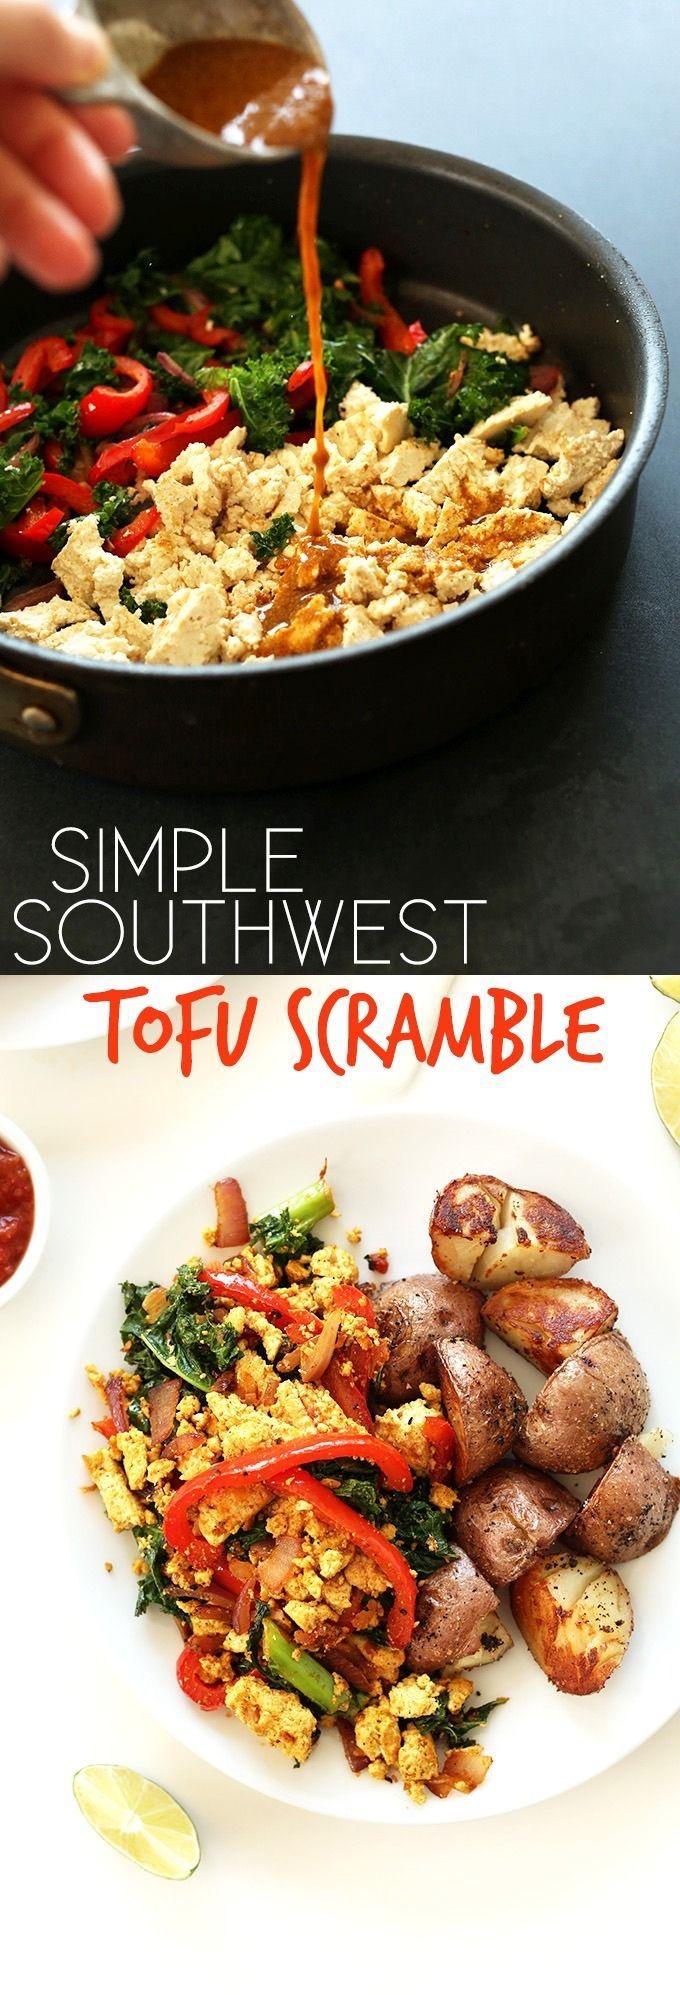 Foodie Tuesdays: Southwestern Tofu Scramble